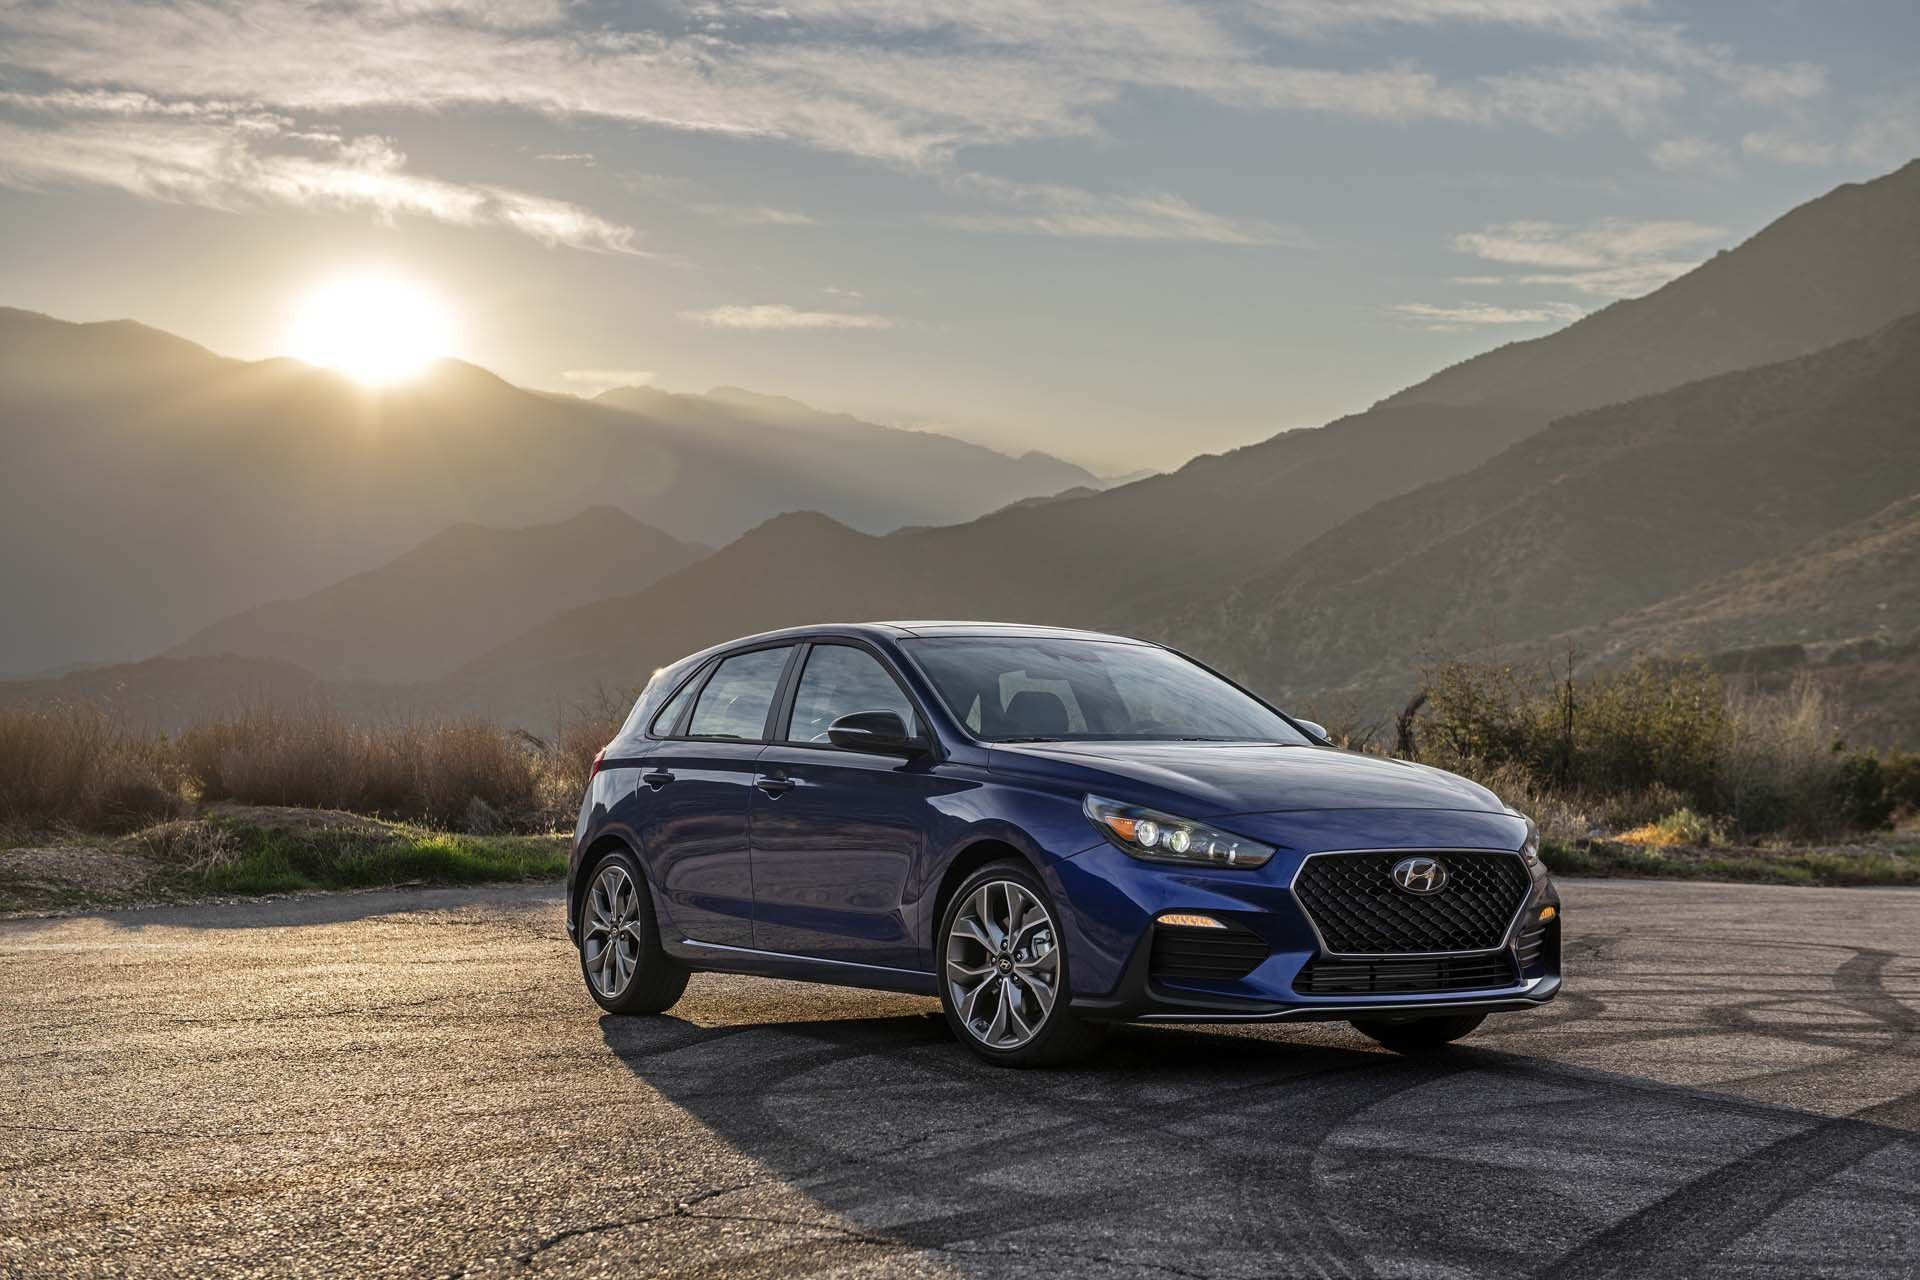 2020 Ford C Max Review And Release Date In 2020 Vw Jetta Tdi Hyundai Elantra Elantra